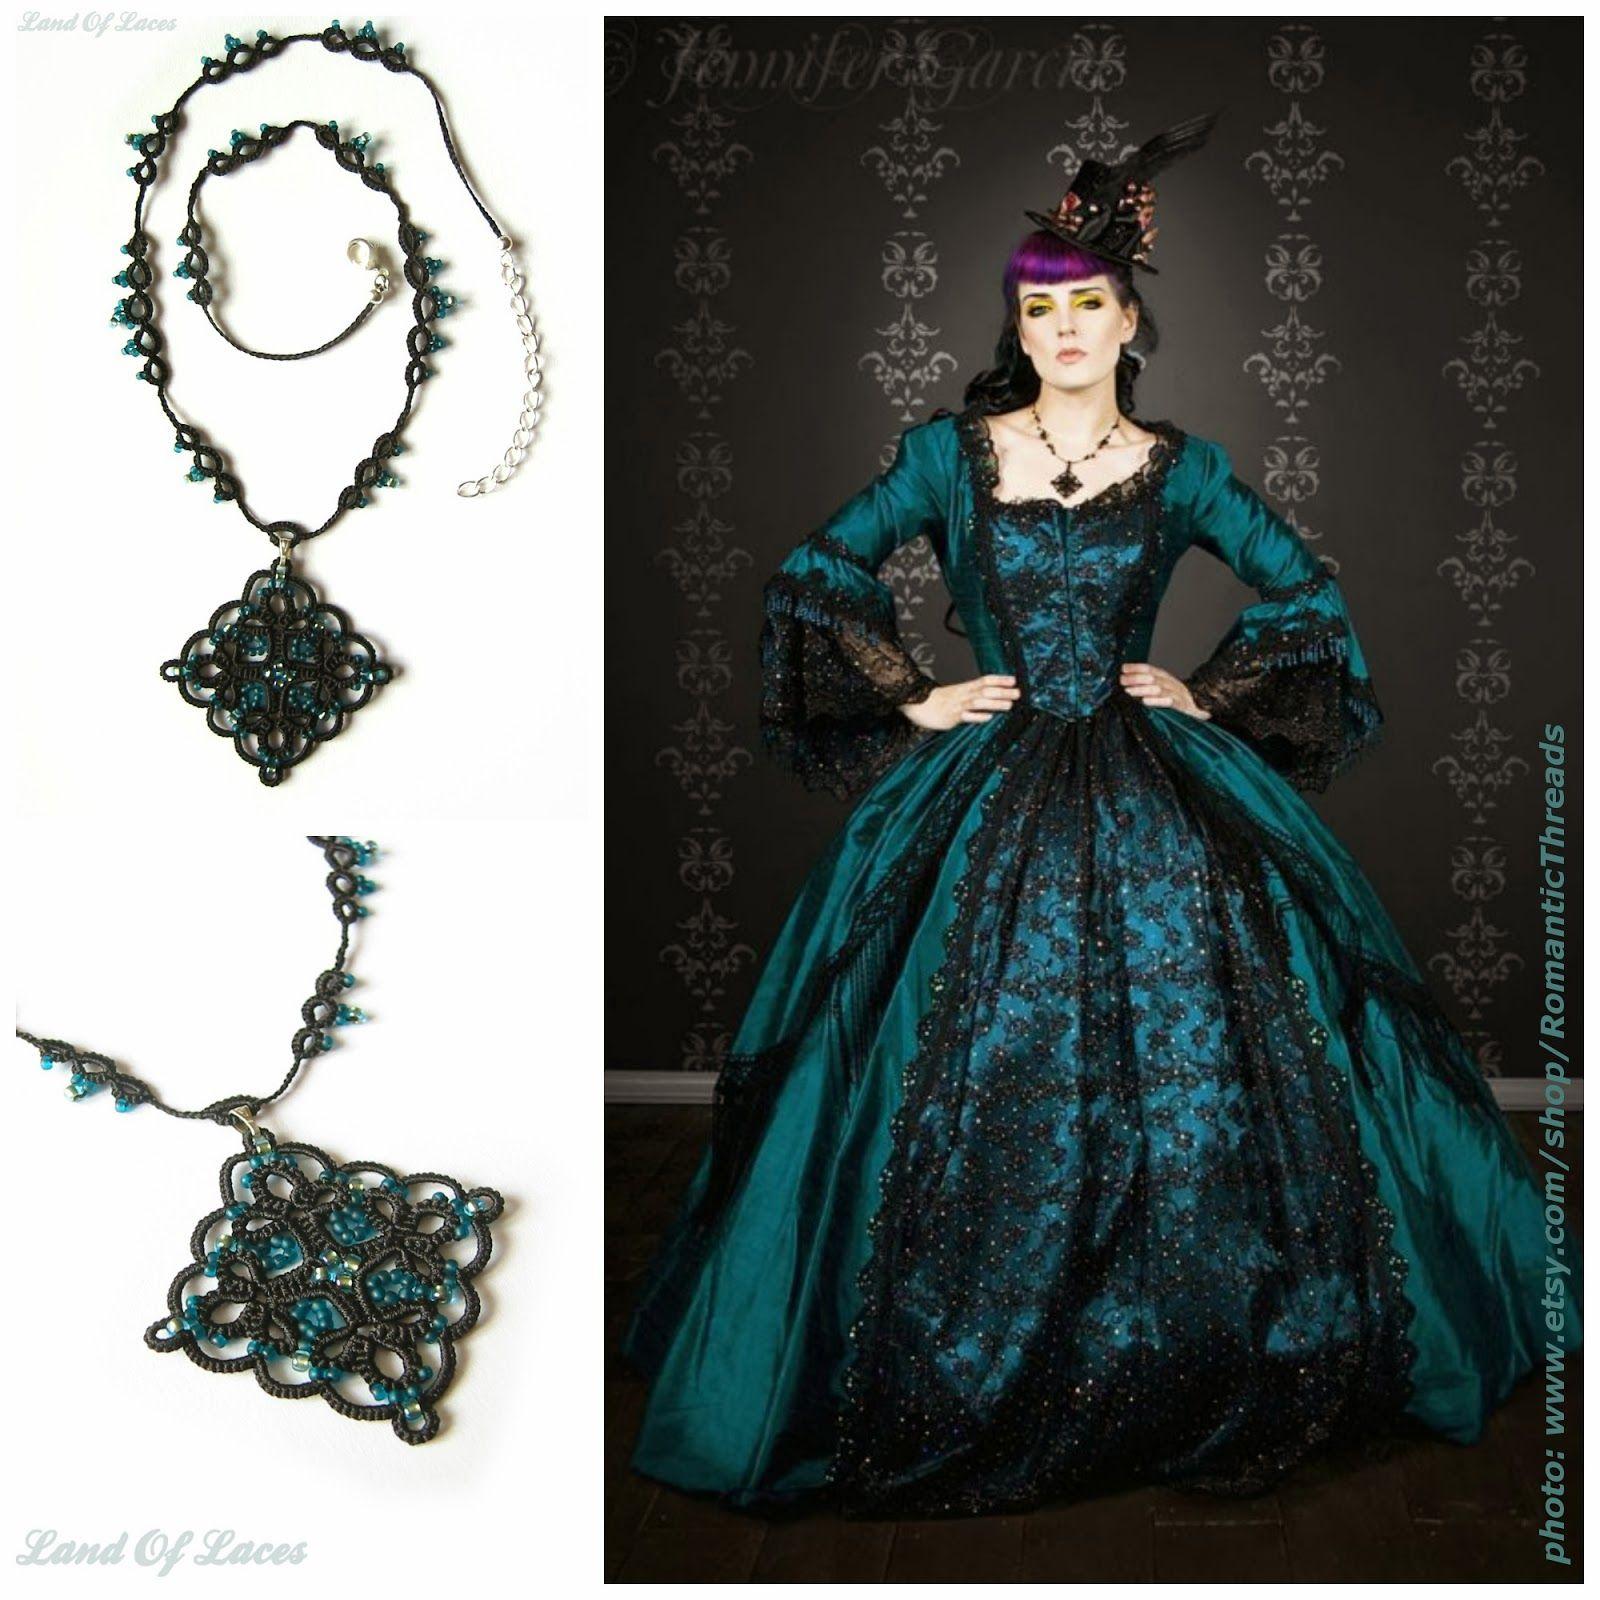 LandOfLAces+Teal+Diamond+Necklace+colage.jpg (1600×1600)